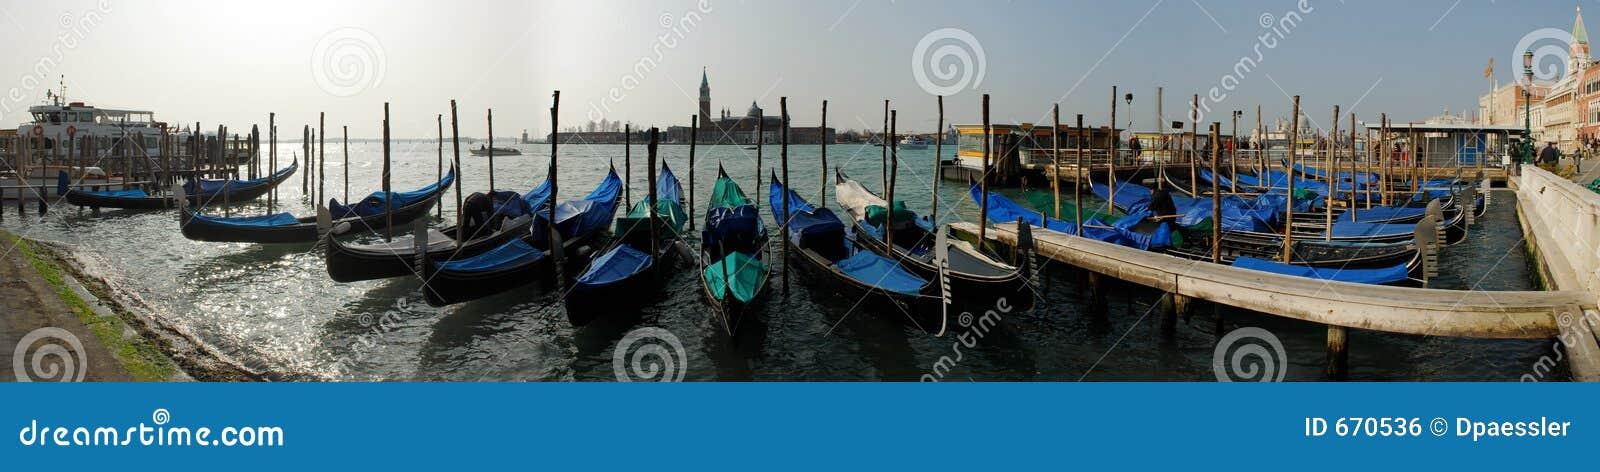 Les gondoles s approchent de Piazza San Marco, Venezia